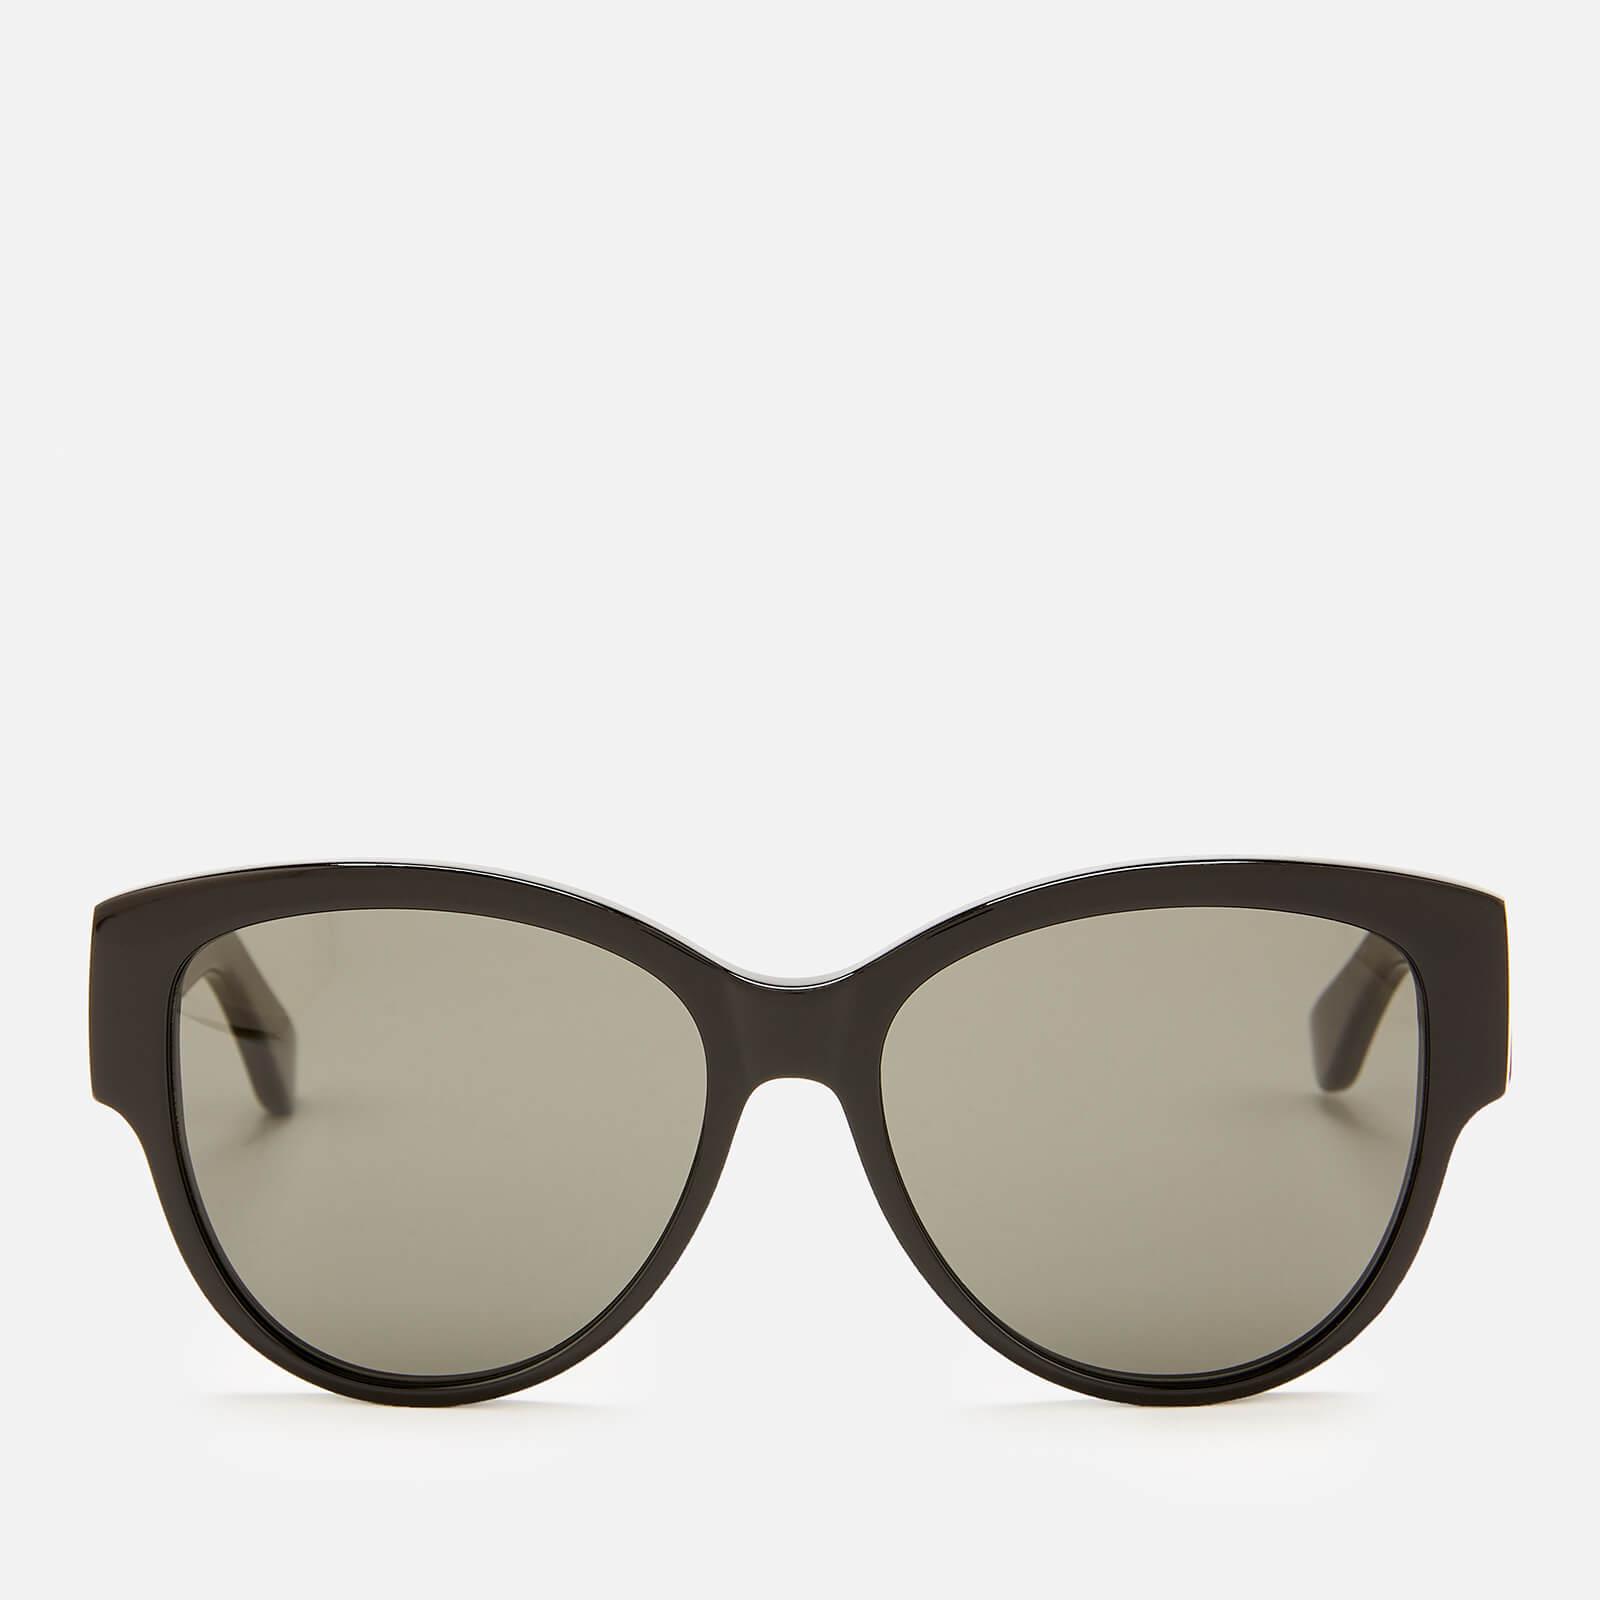 9fc4dfd43d3 Saint Laurent Women's Oversized Round Frame Sunglasses - Black - Free UK  Delivery over £50